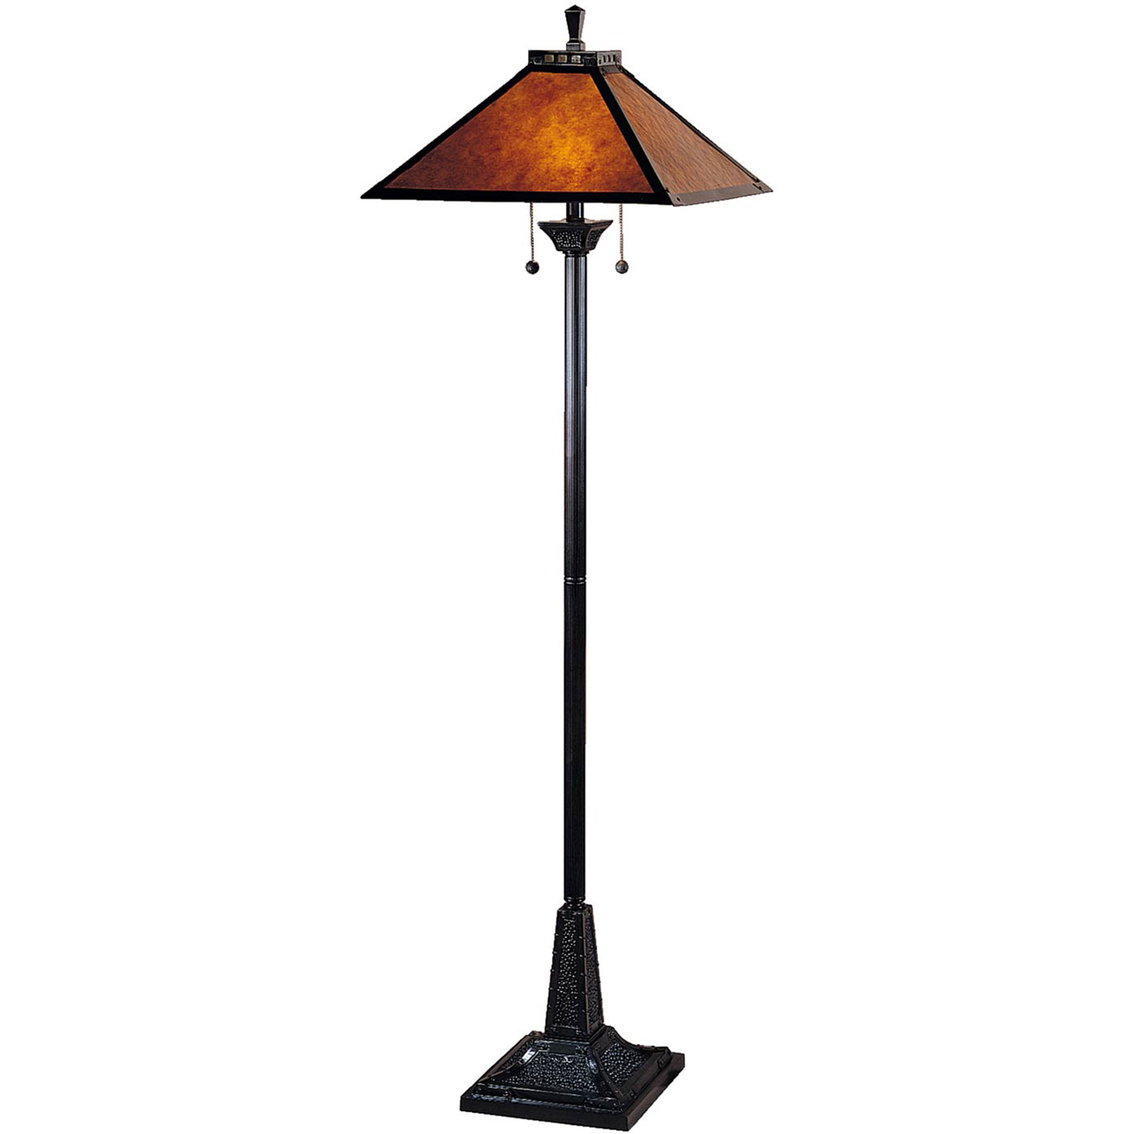 Dale Tiffany Mica Camelot Floor Lamp Lamps Home Amp Appliances Shop The Exchange